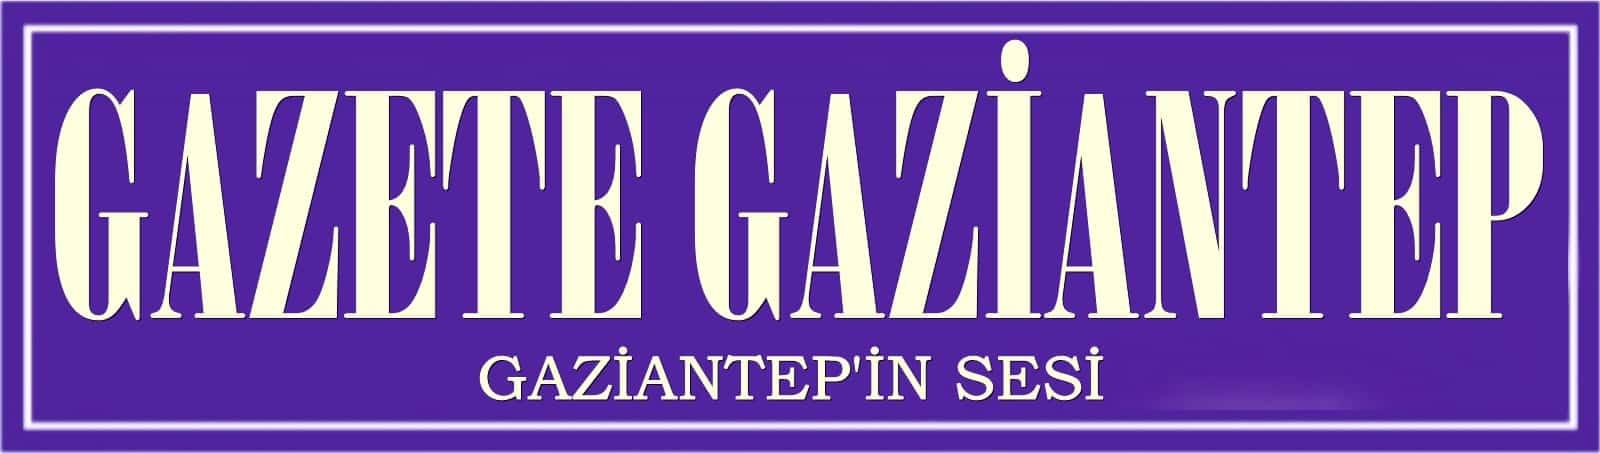 Gazete Gaziantep